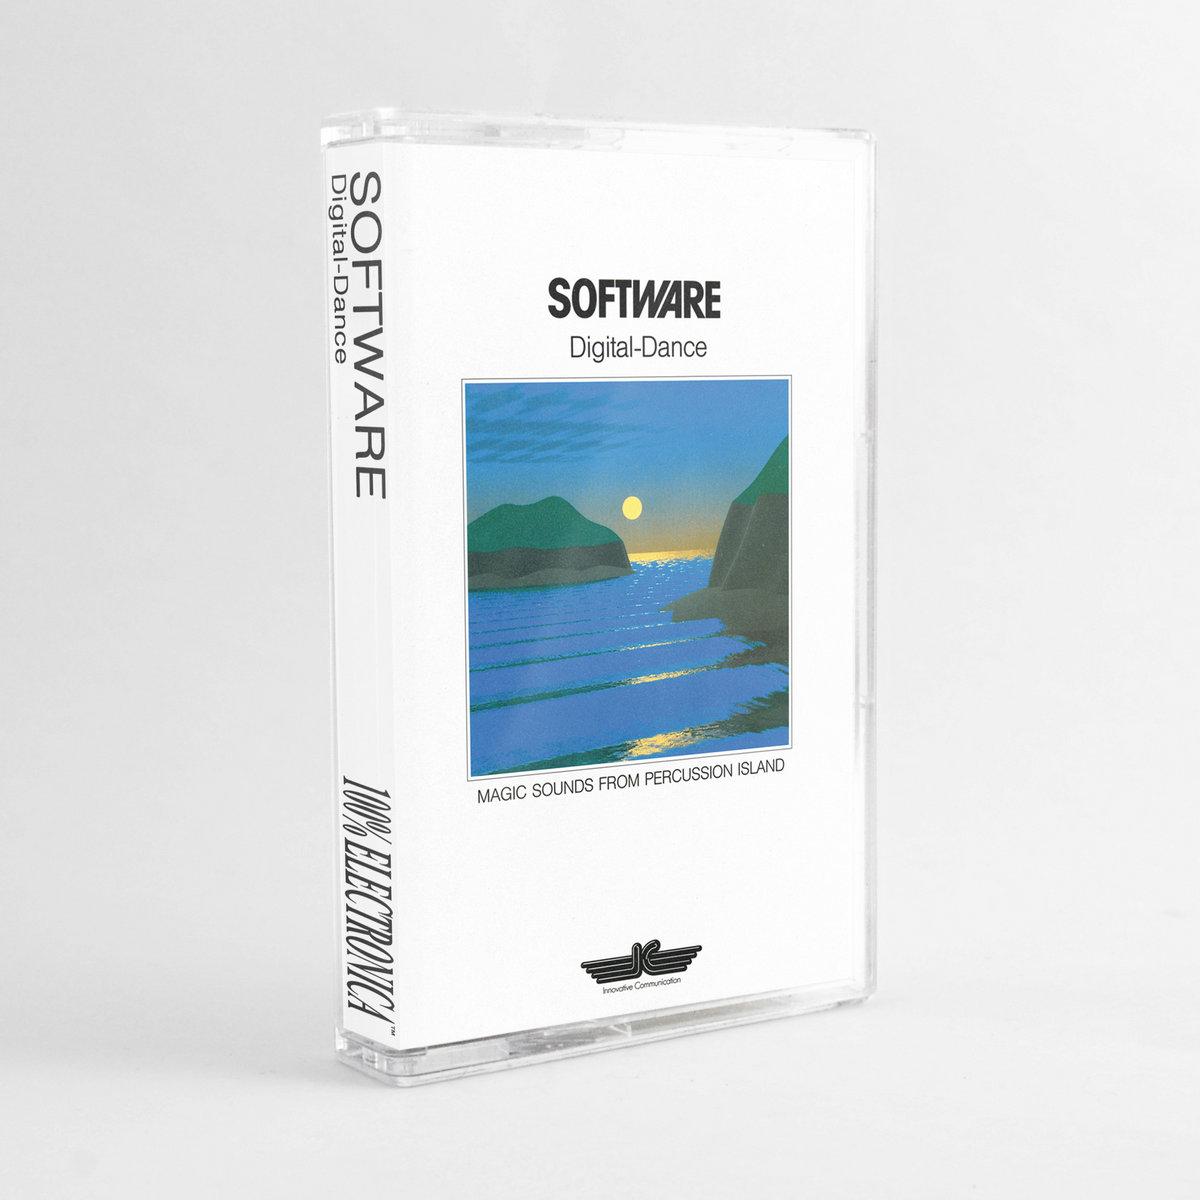 Digital-Dance | SOFTWARE